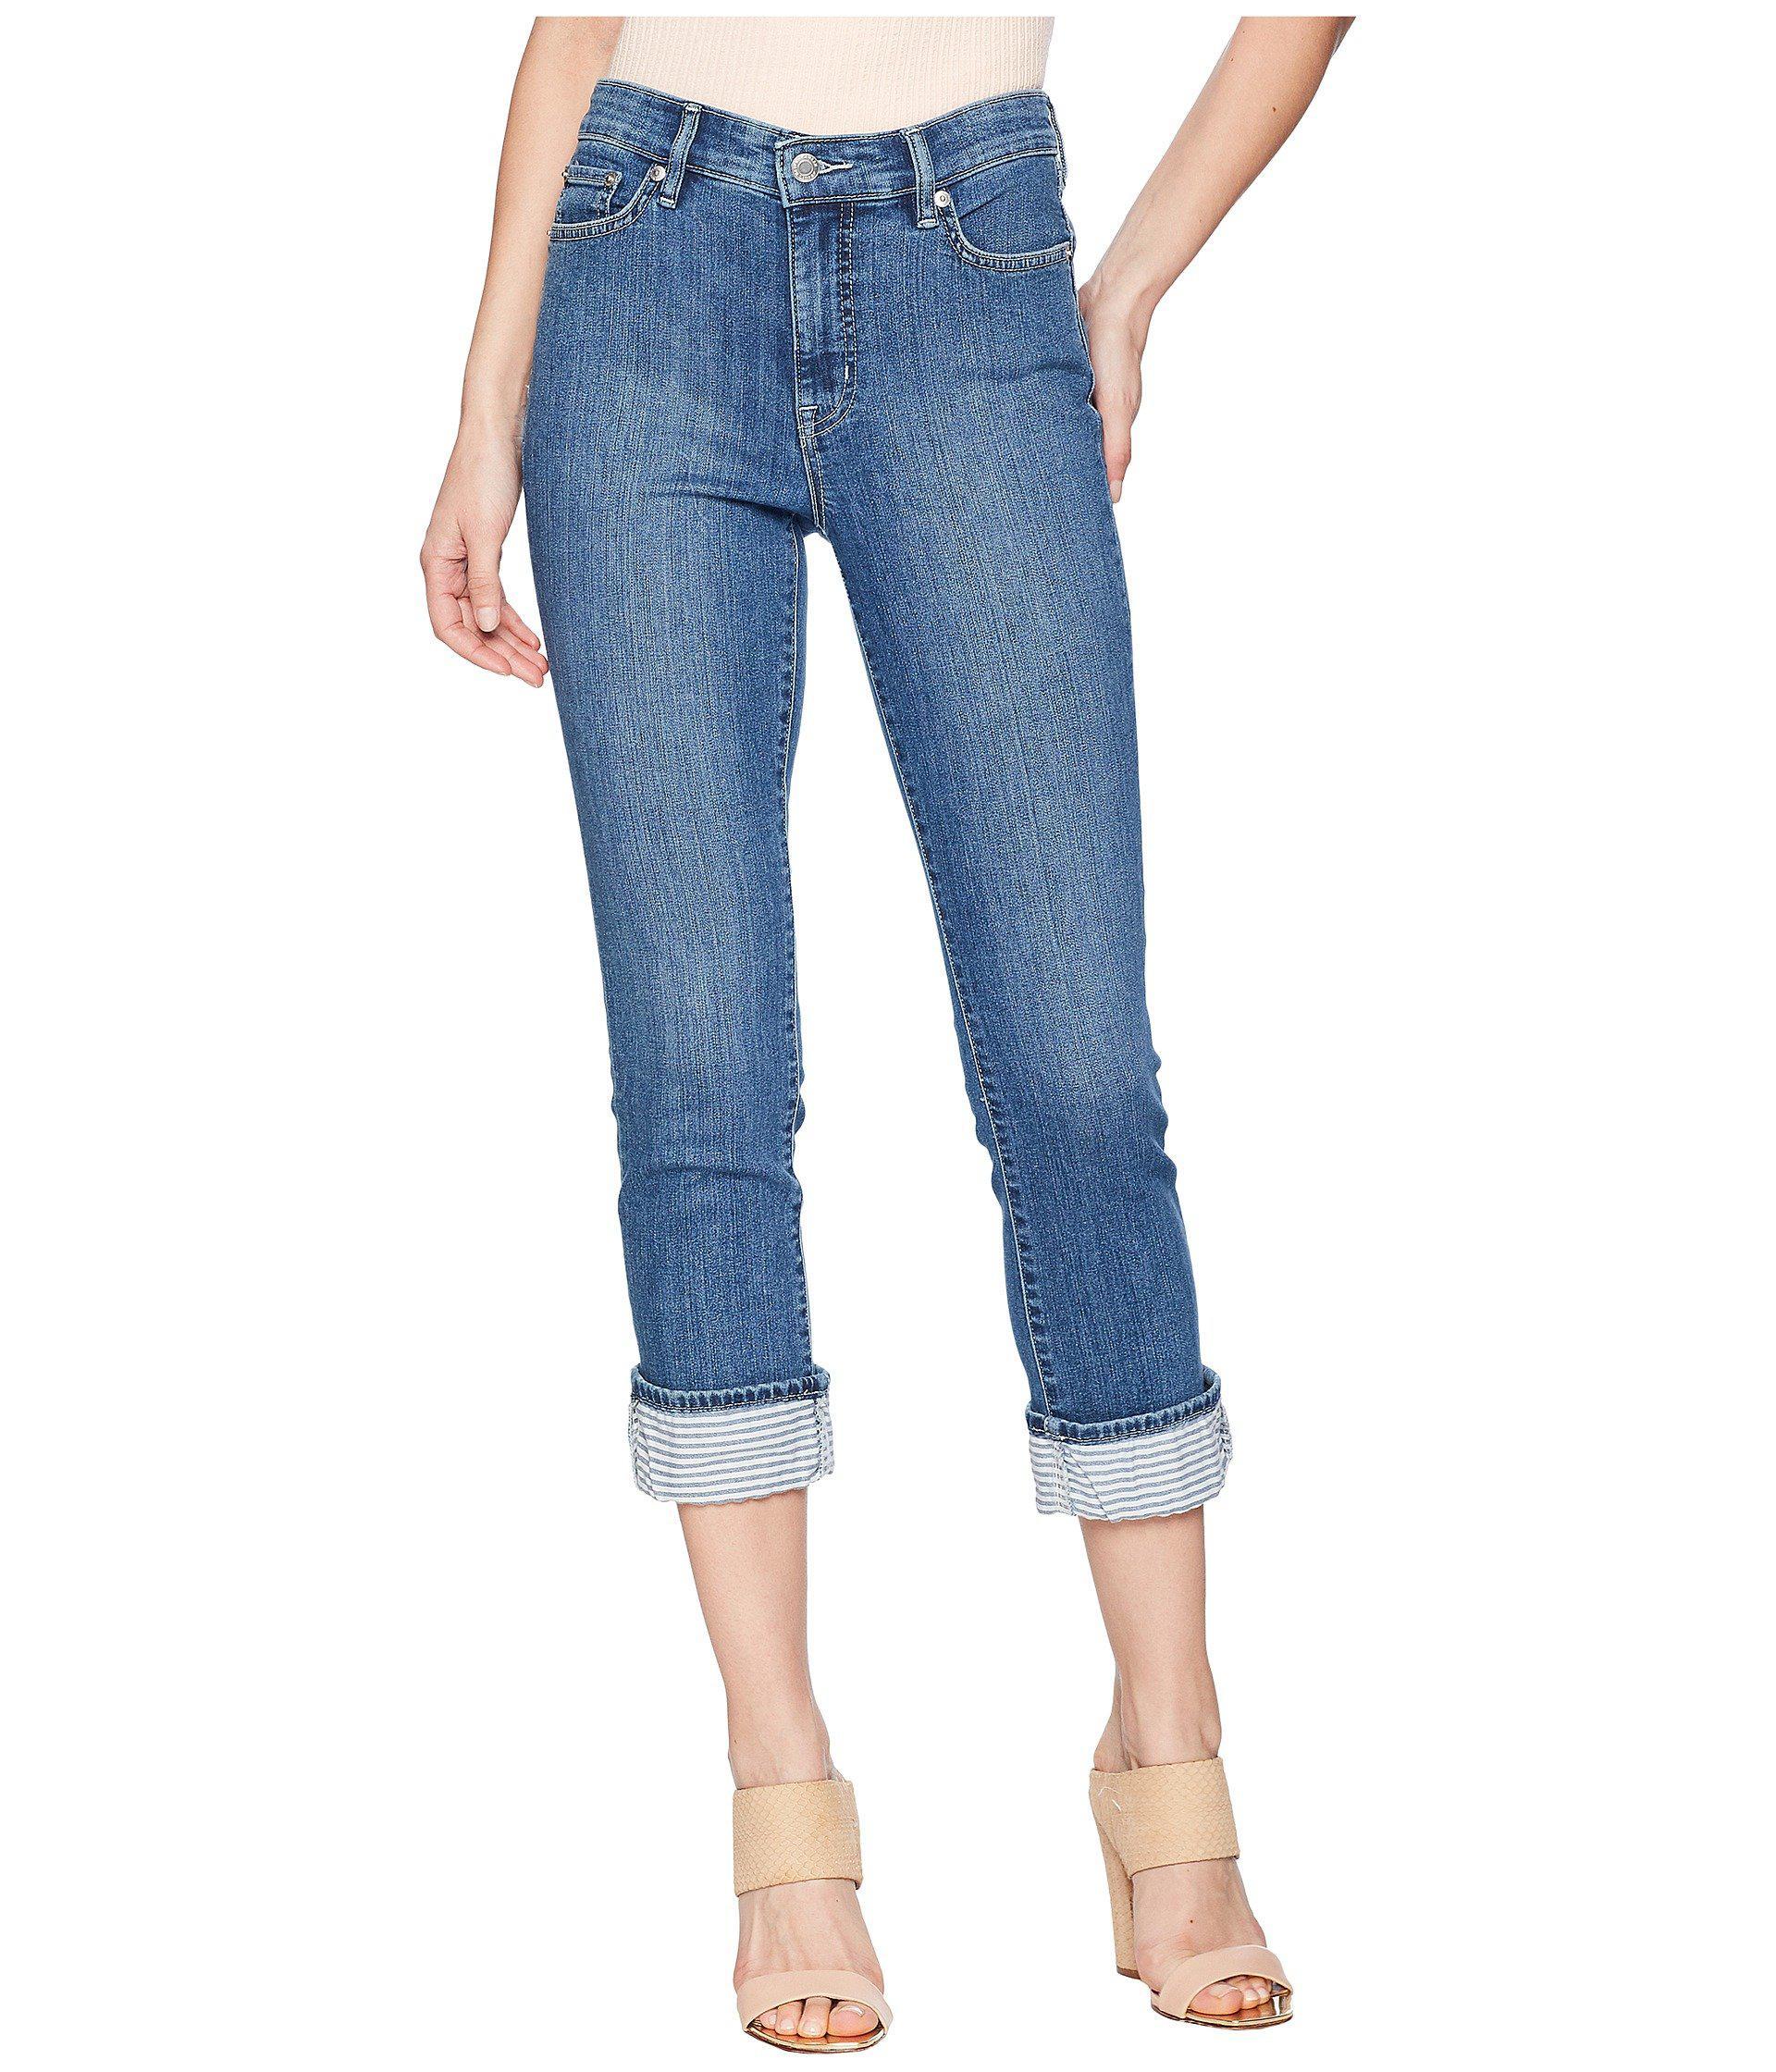 55b2f0f9874ab Lyst - Lauren by Ralph Lauren Premier Straight Crop Jeans in Blue ...